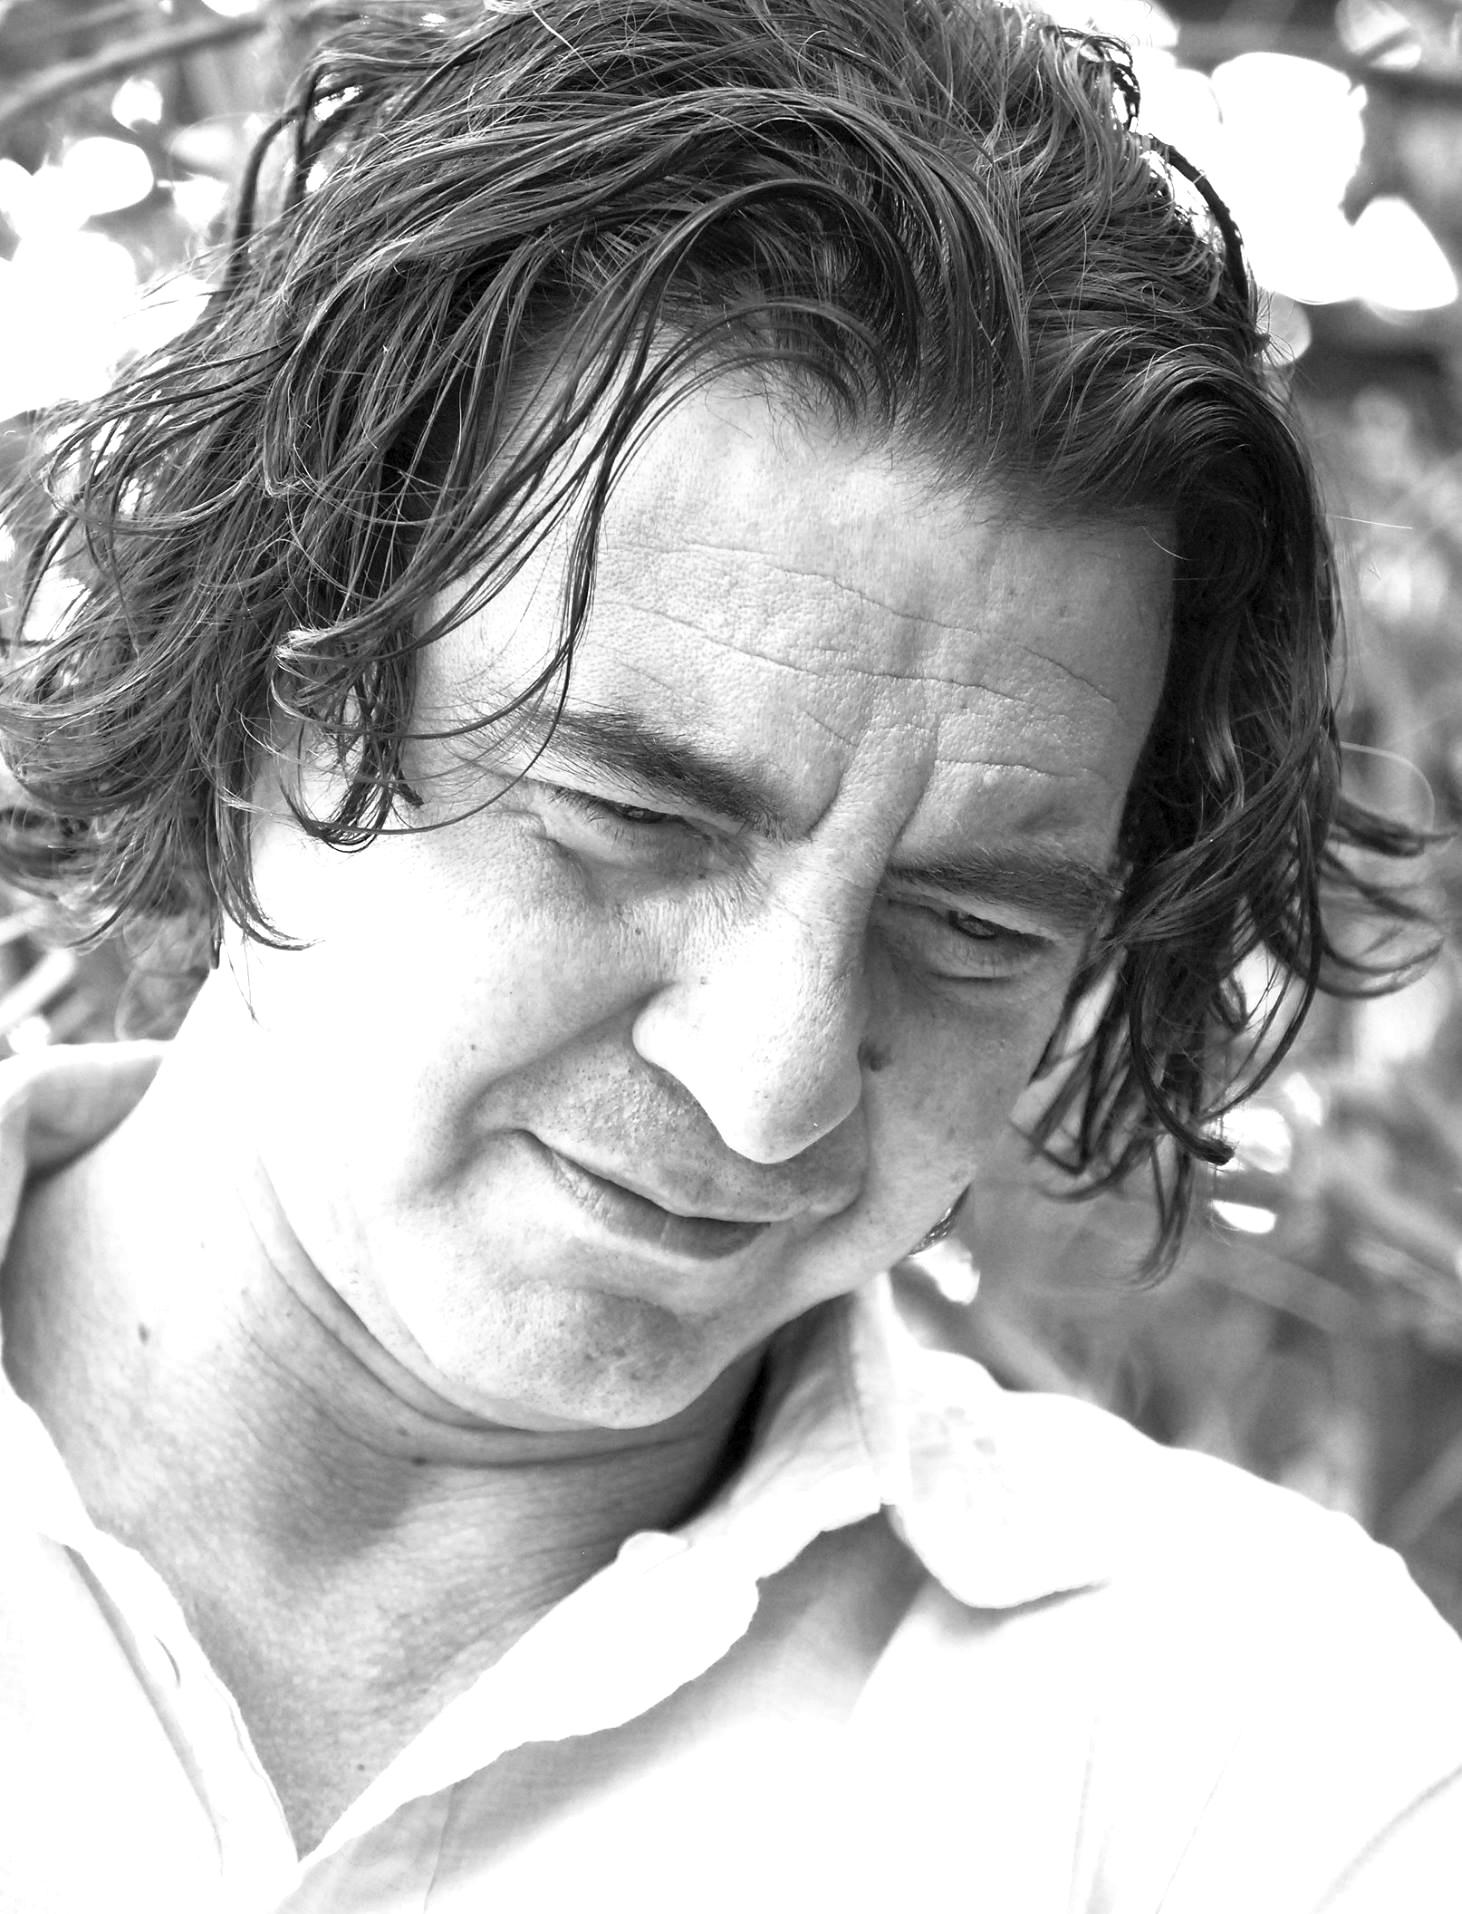 Giuseppe Wochicevick italia poeti cctm bacio beso a noi piace leggere